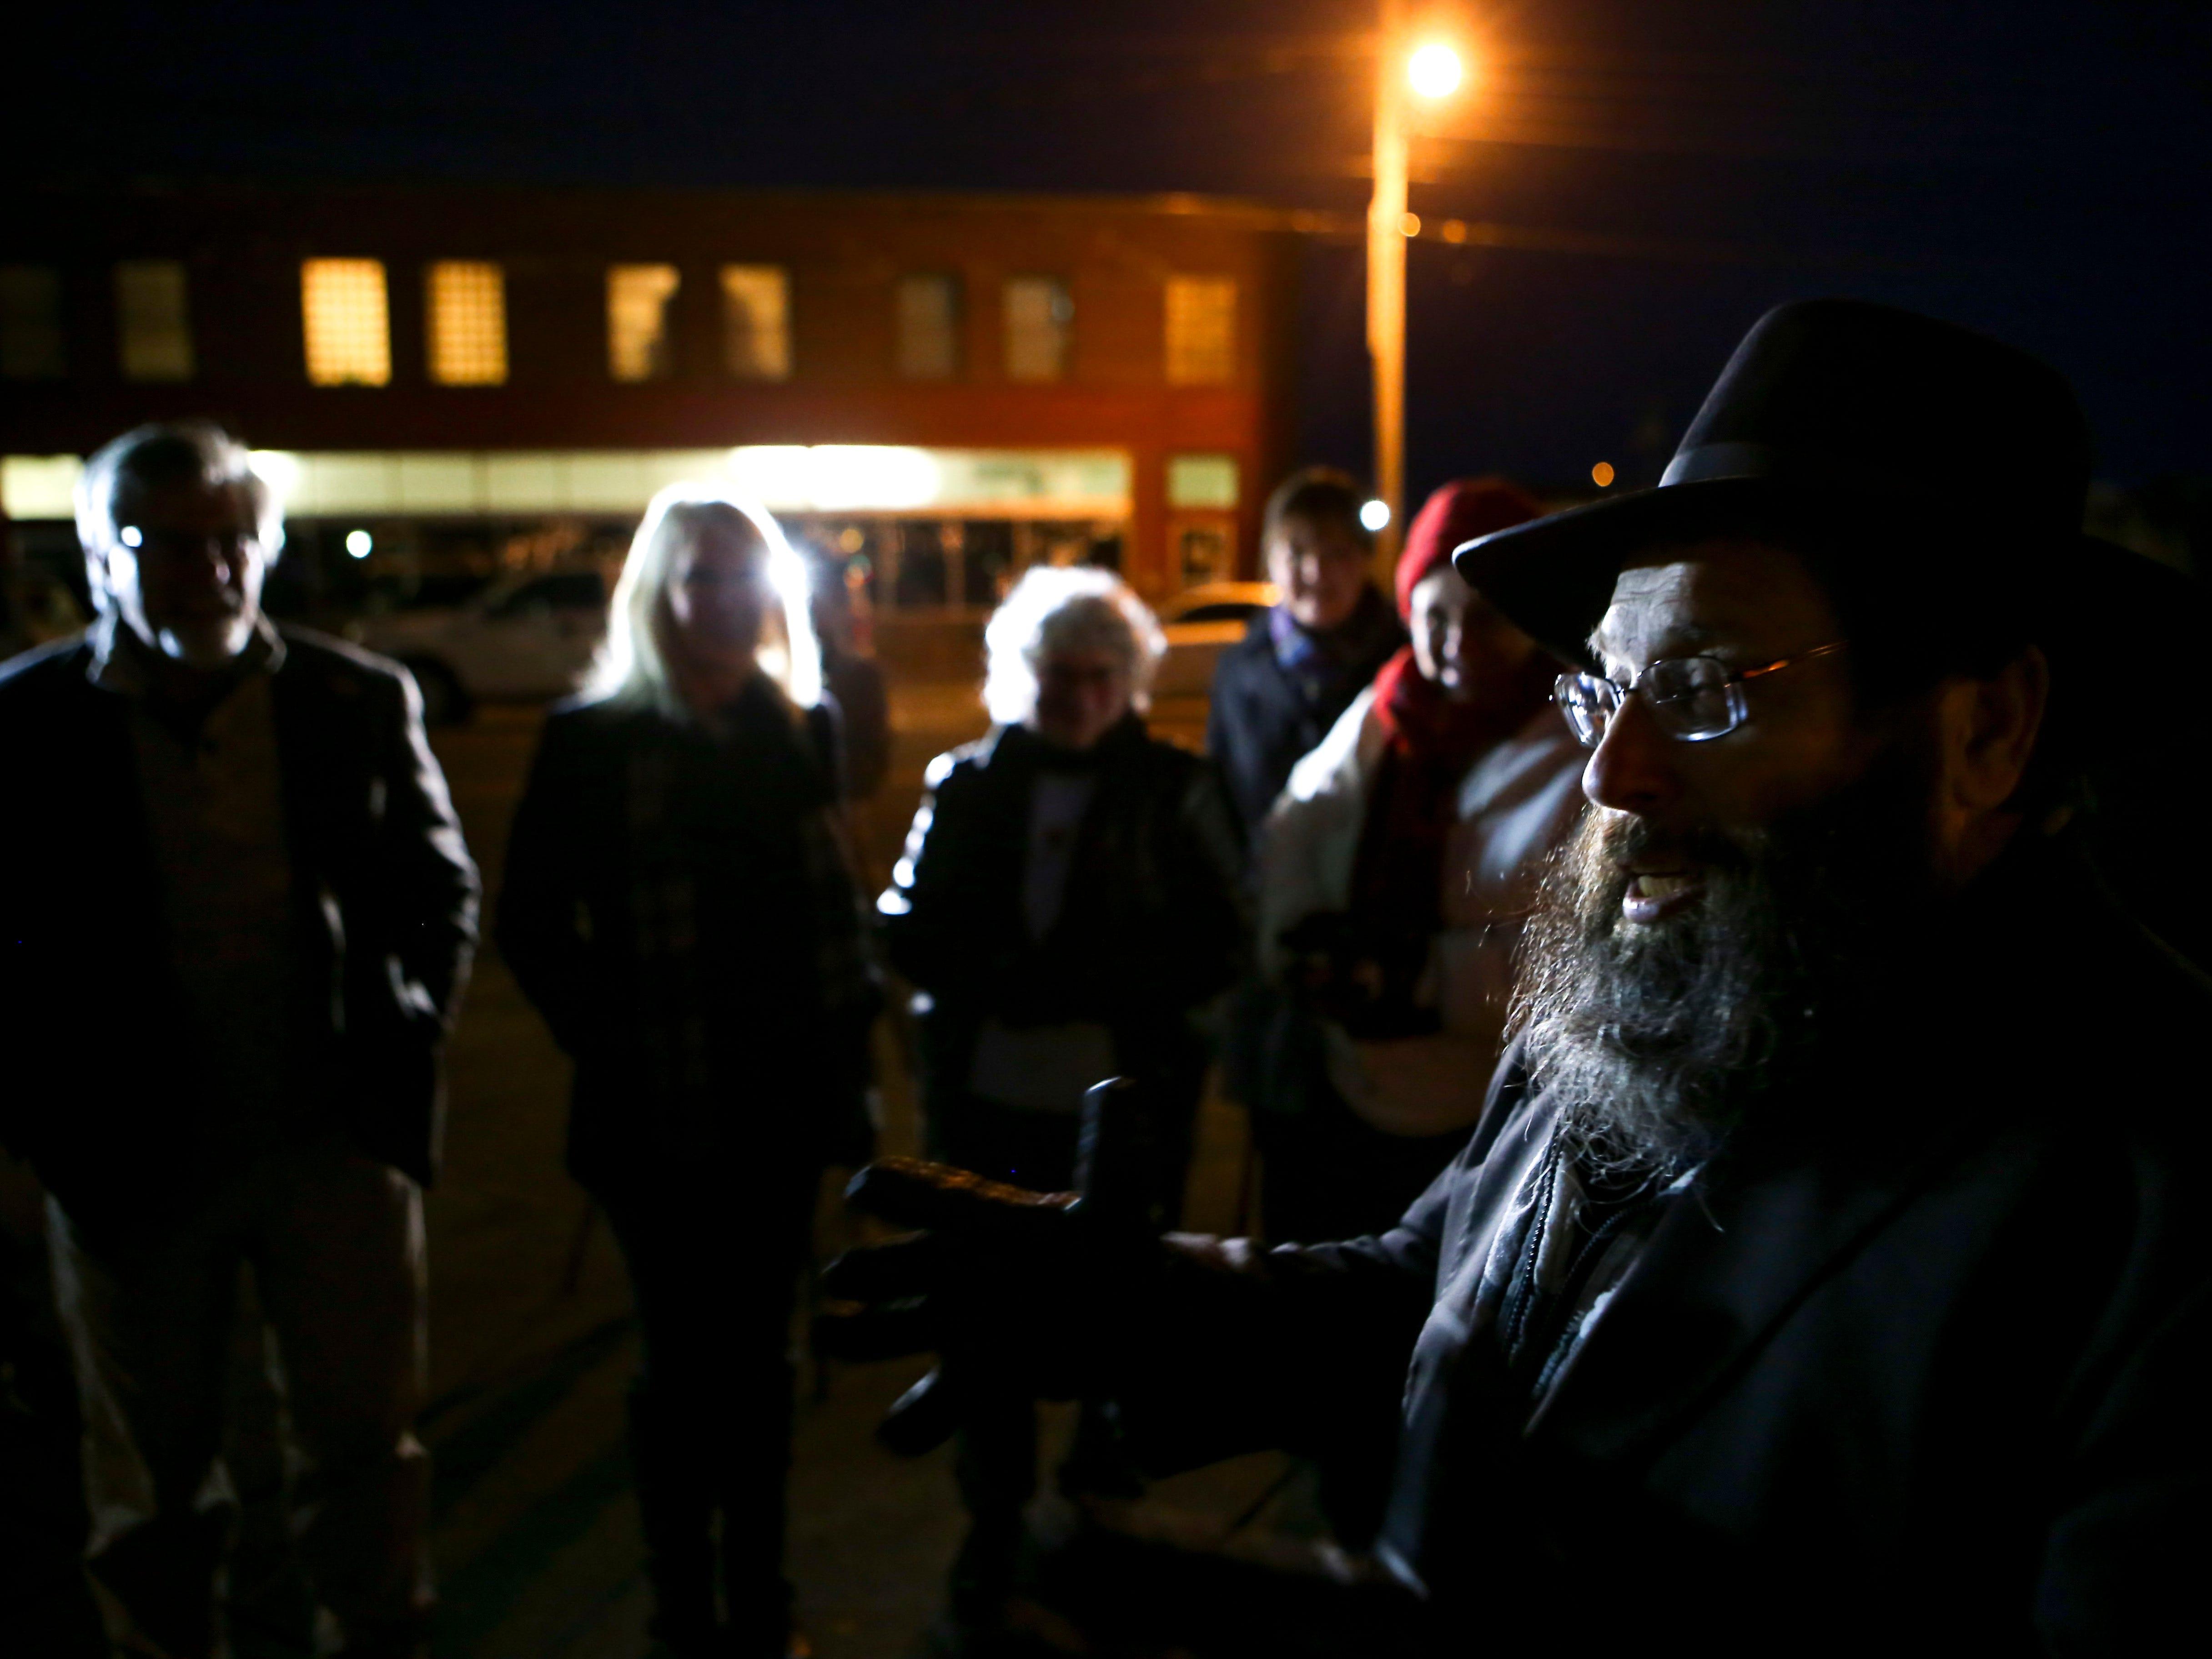 Rabbi Yankel Ginsburg shares the story of the importance of Hanukkah during the first public Hanukkah Menorah Lighting at Anderson Park in Jackson, Tenn., on Thursday, Dec. 6, 2018.